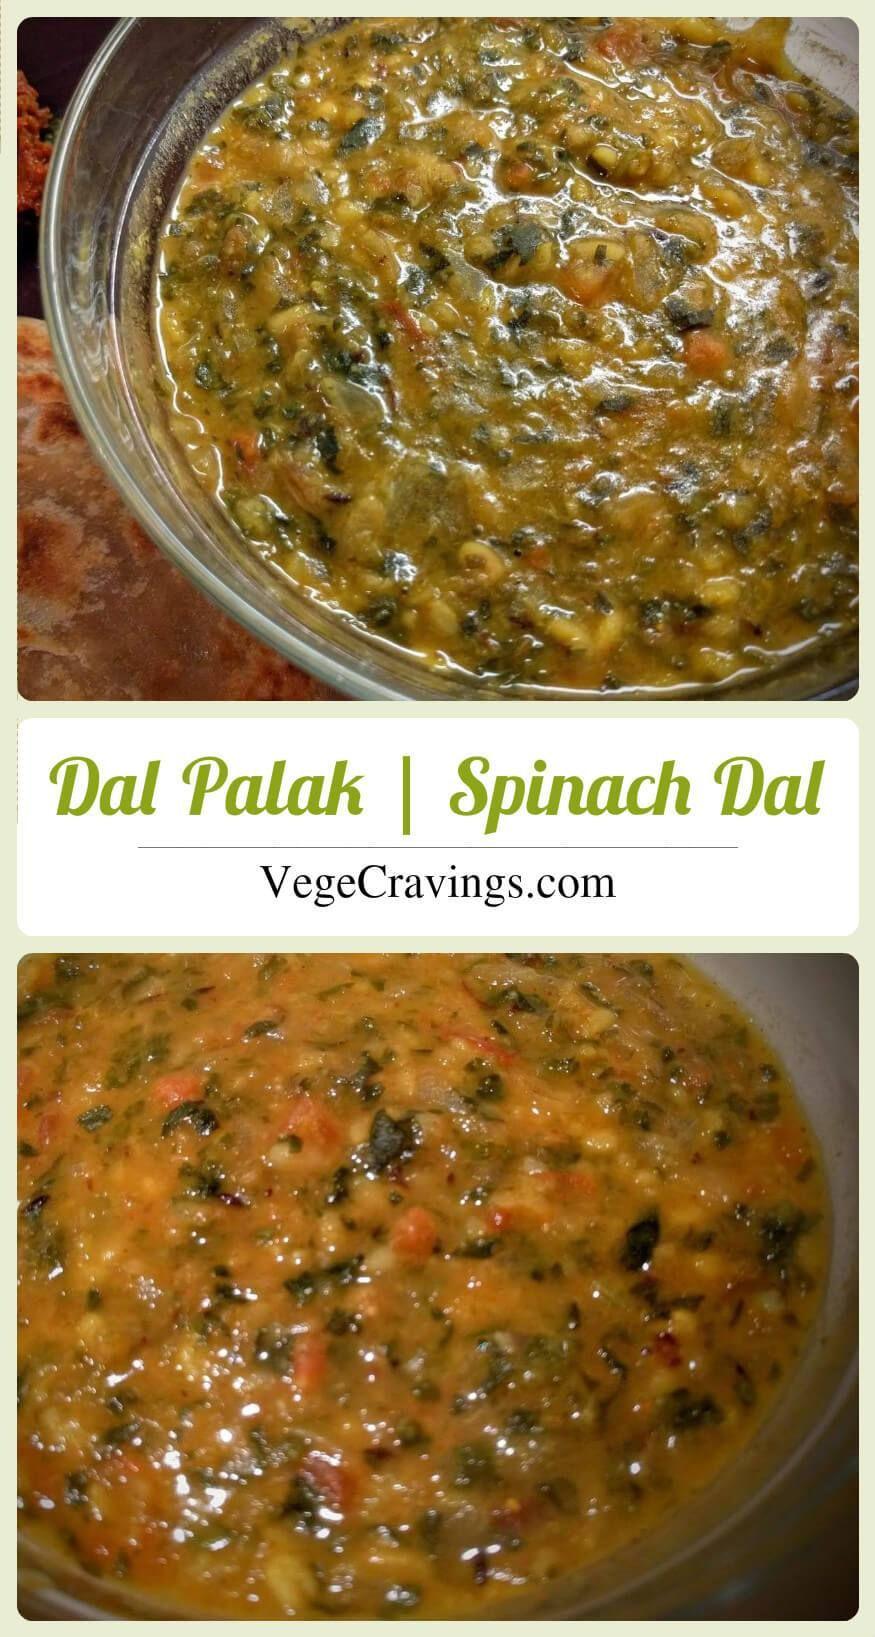 Dal Palak Recipe | Spinach & Lentil Stew | VegeCra